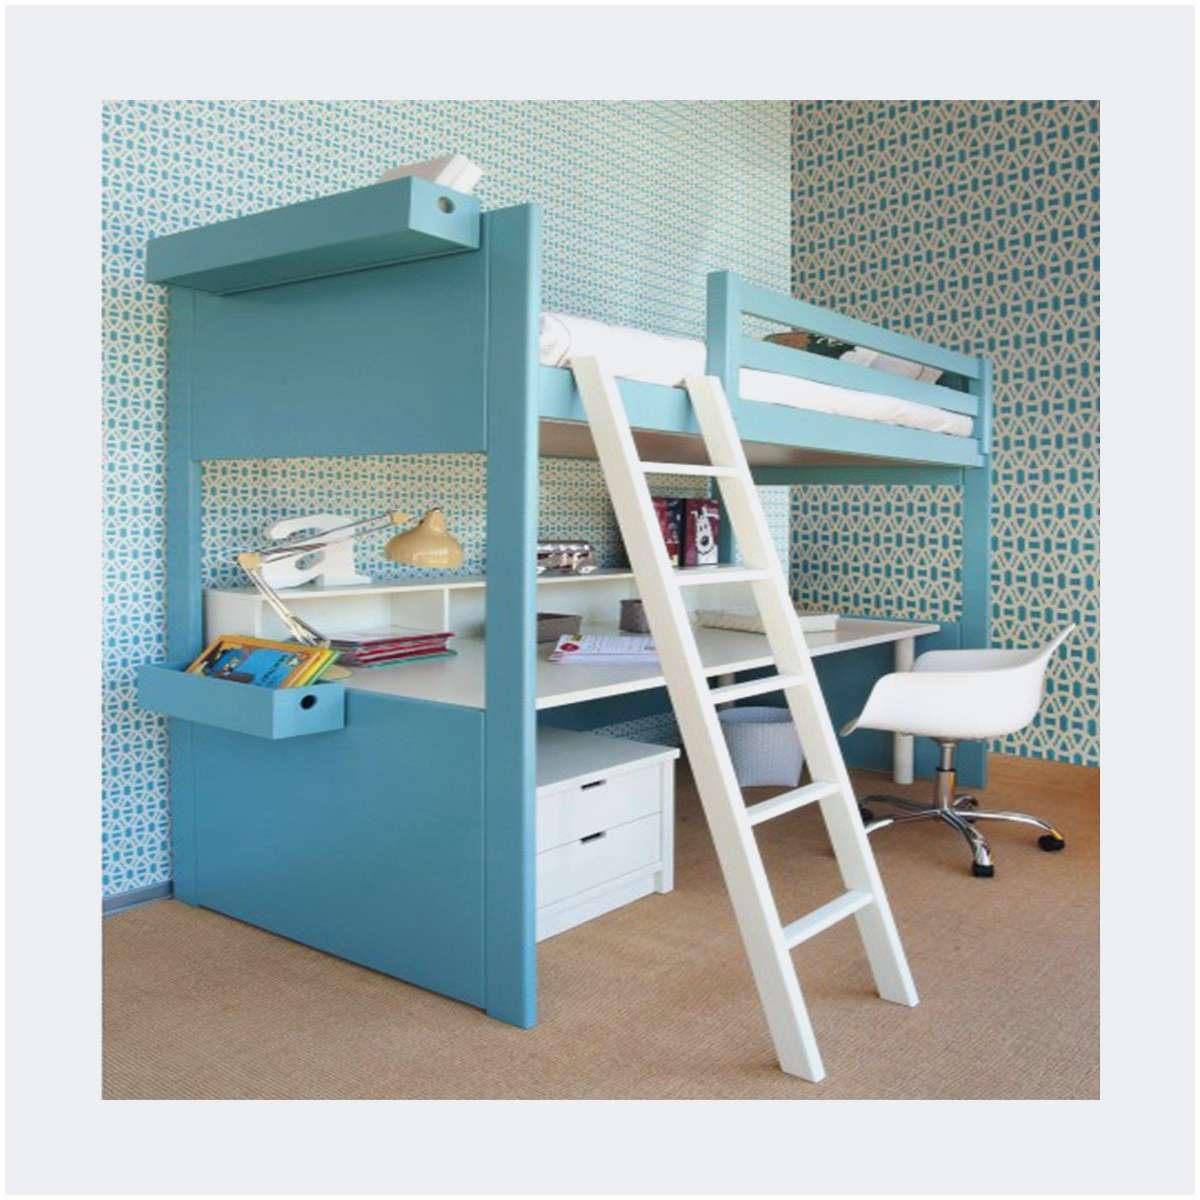 Lit Mezzanine Bureau Joli Beau Lit Mezzanine Pour Ado Lit Bureau Frais Bureau 2 Places Beau